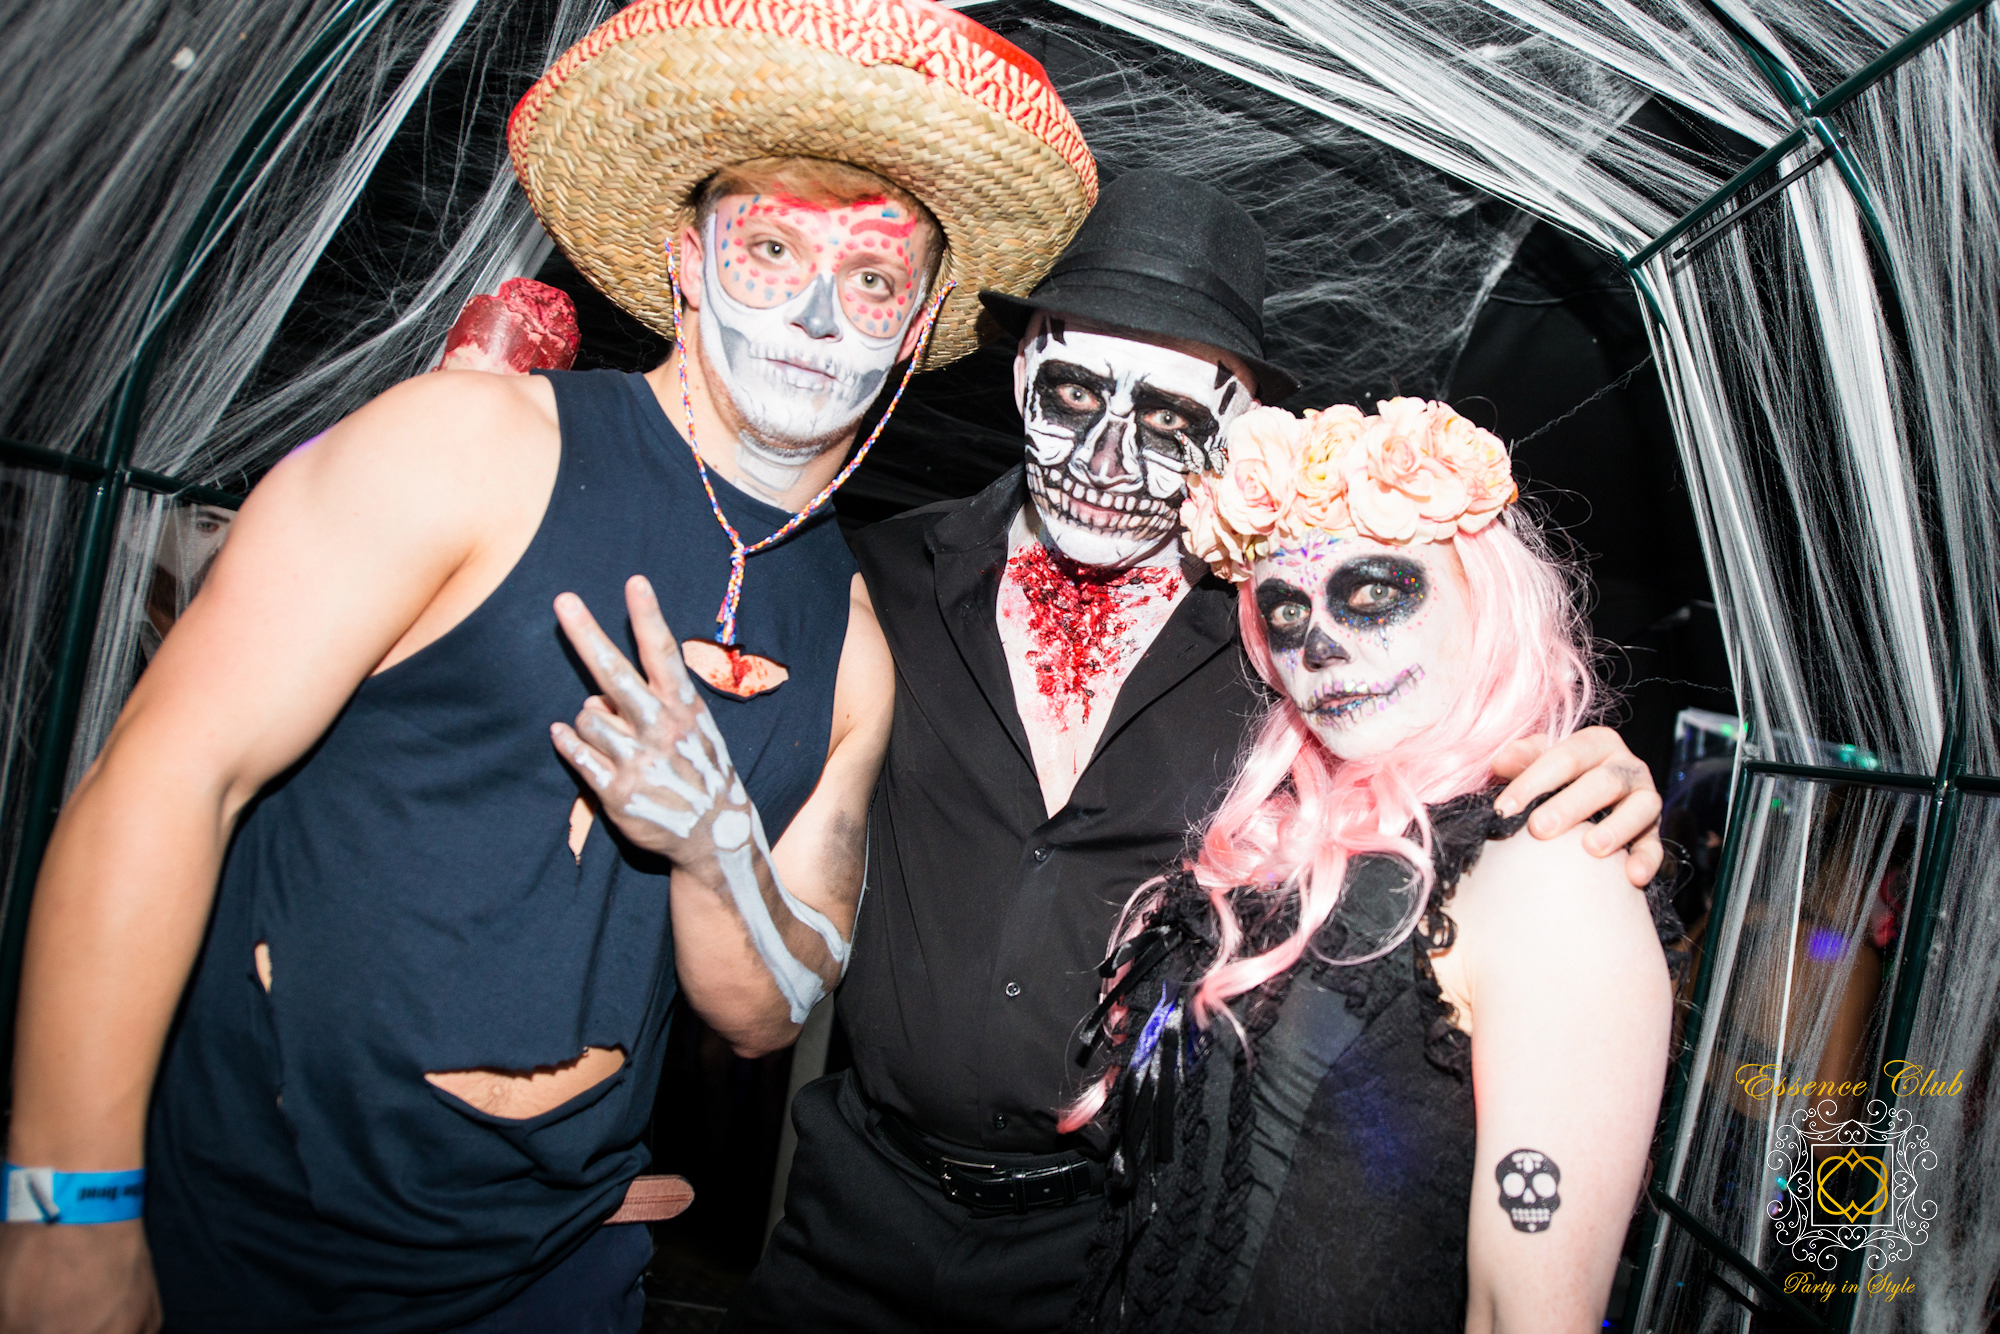 Halloween essence clubing